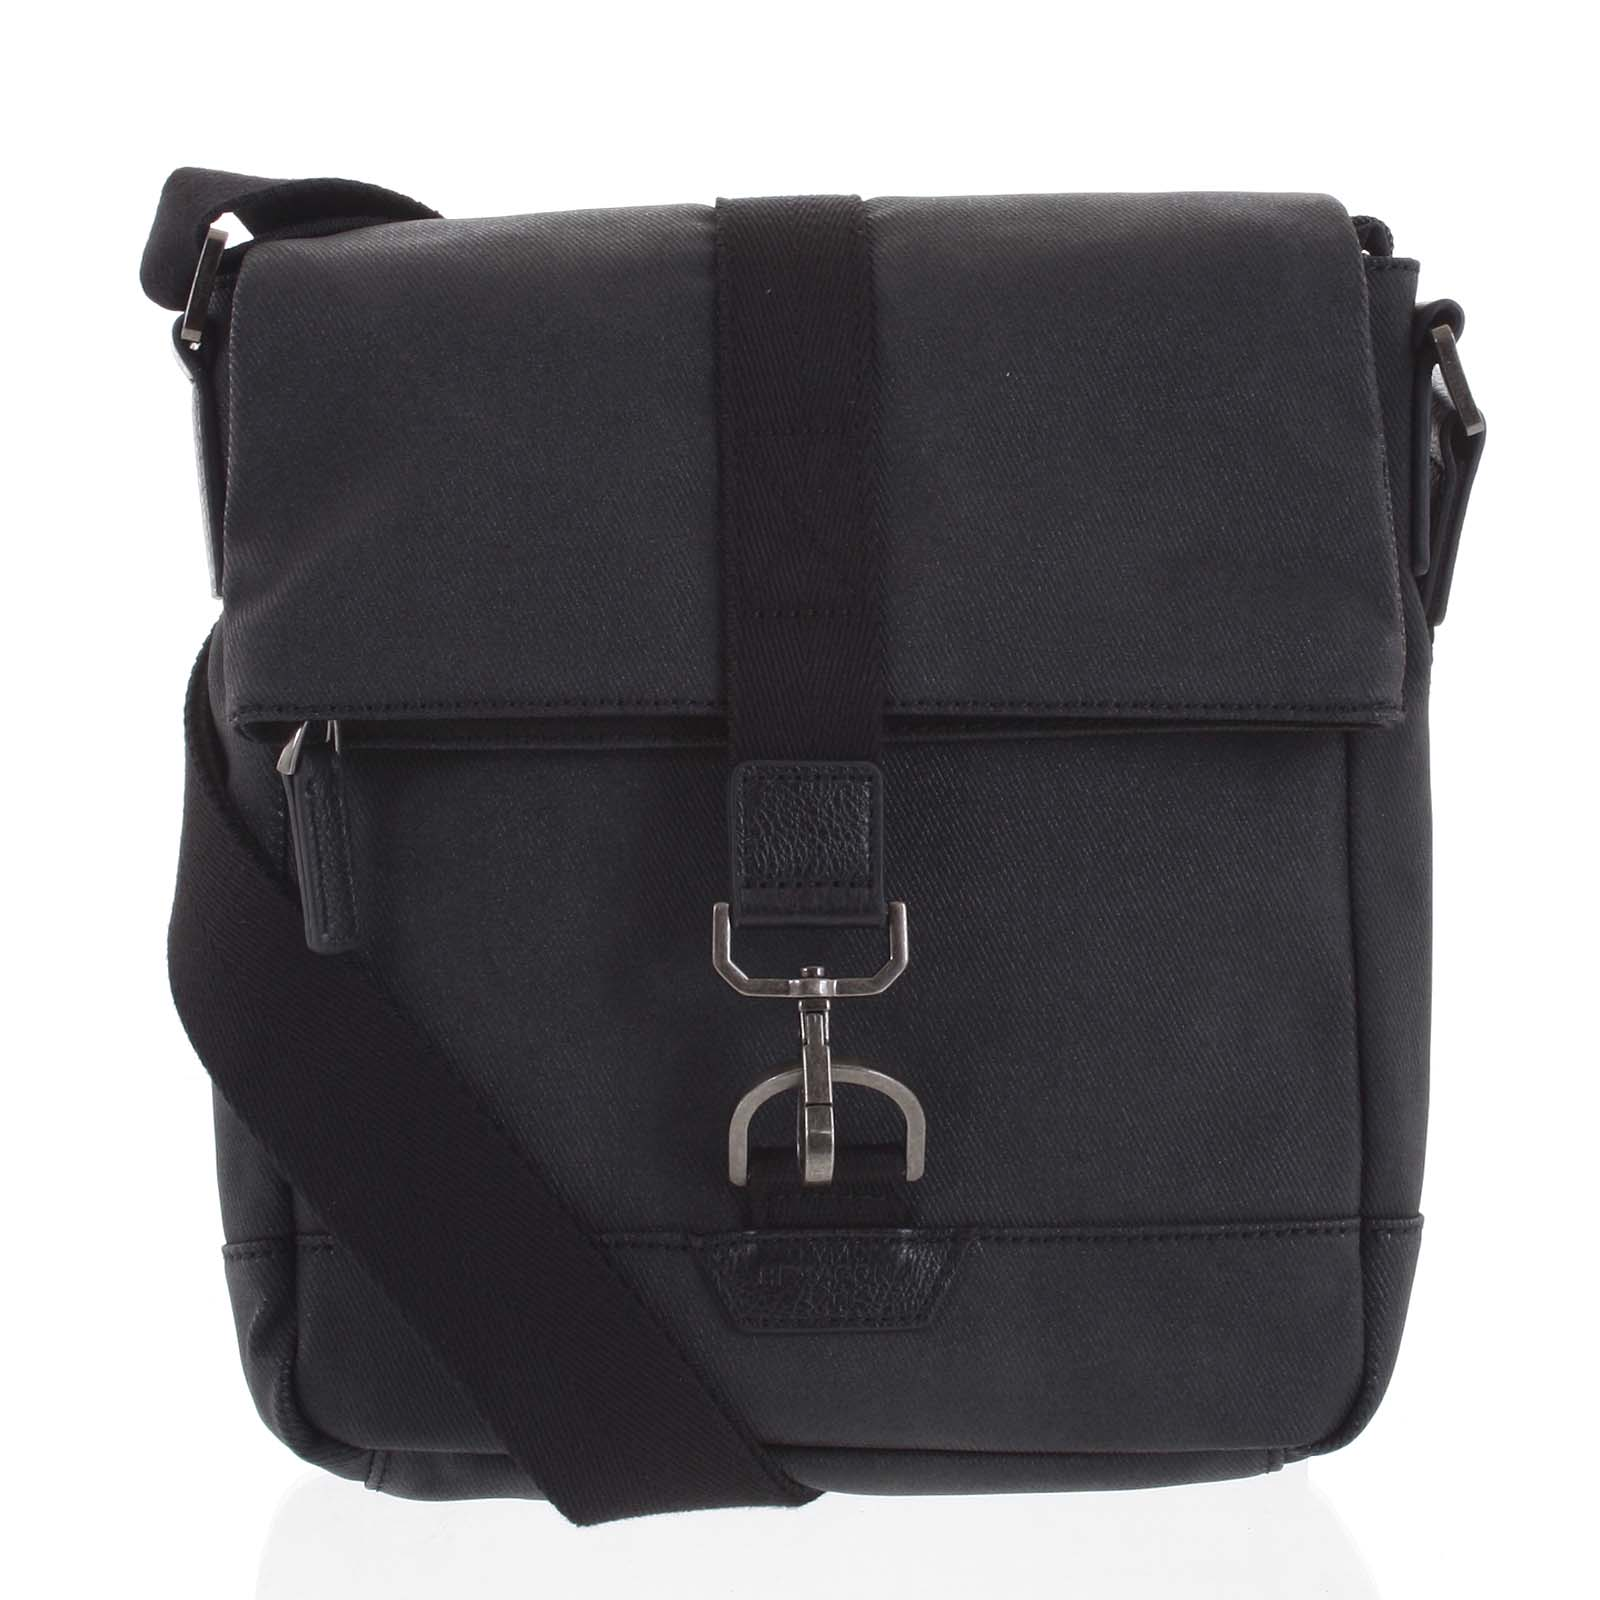 Pánská taška přes rameno černá - Hexagona Bennio